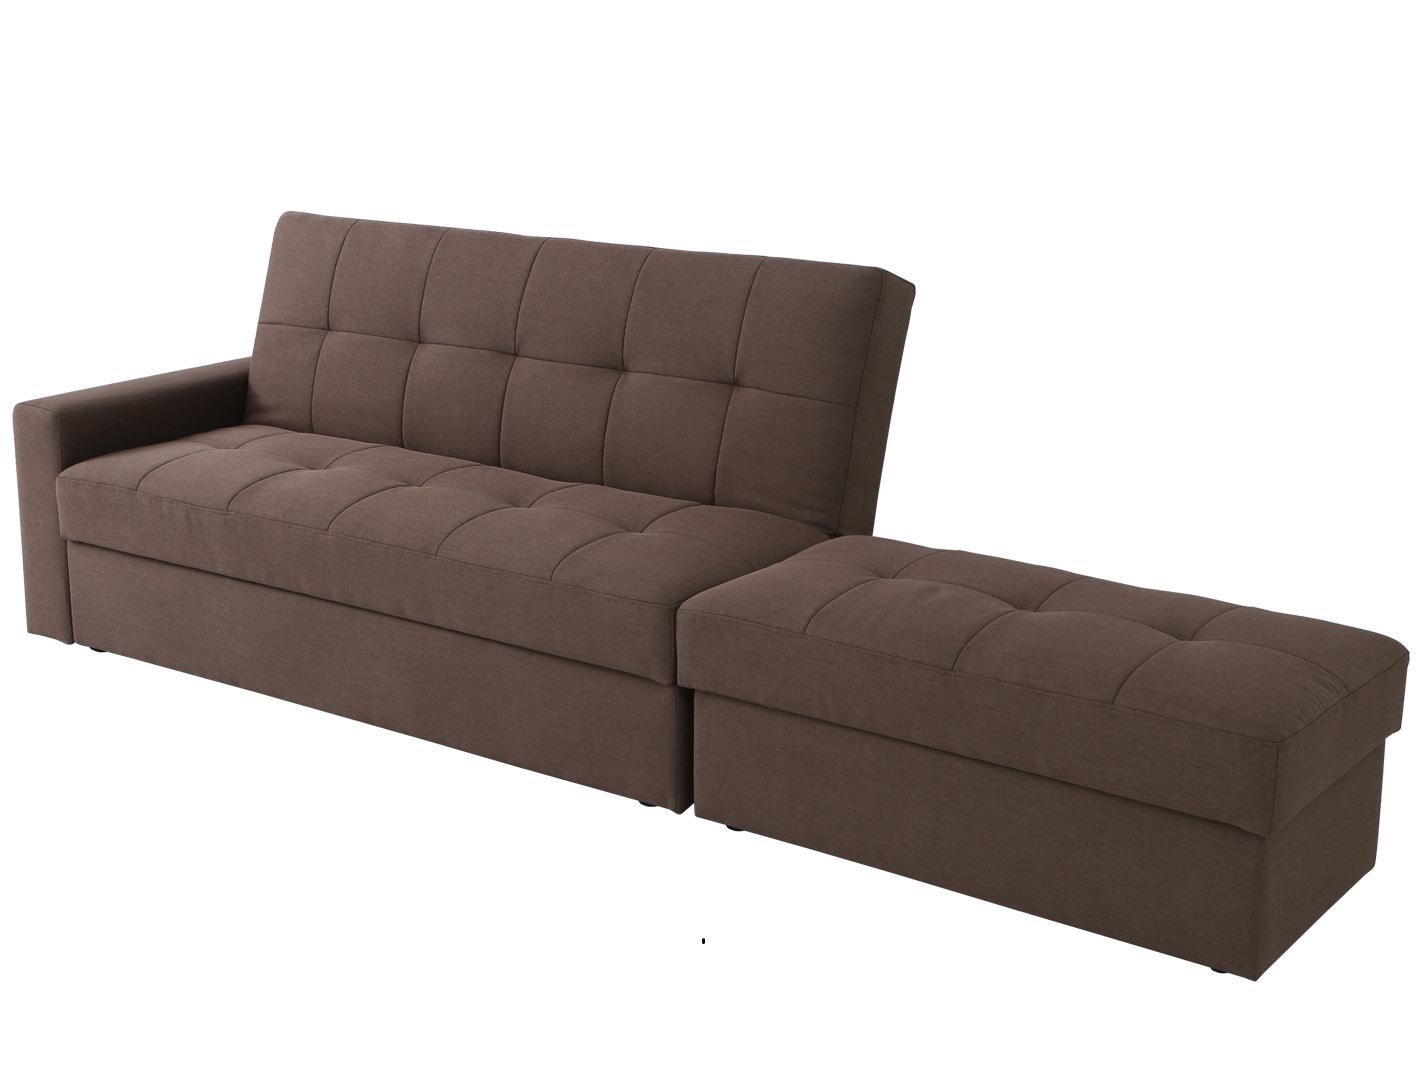 Storage Sofa Bed Bench Lcf